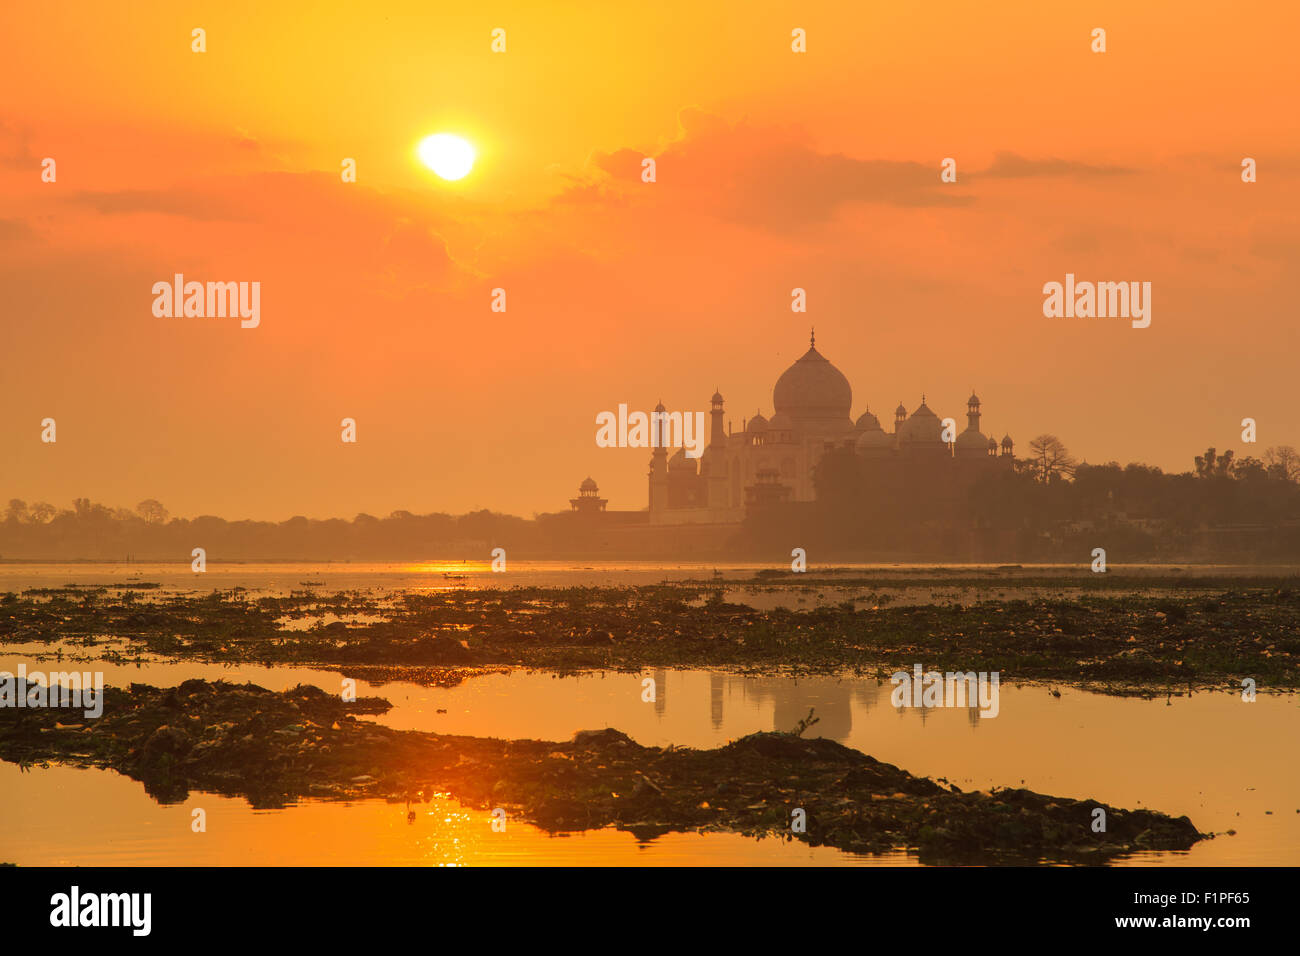 Ein Sonnenaufgang Blick des Taj Mahal in Agra, Indien. Stockbild